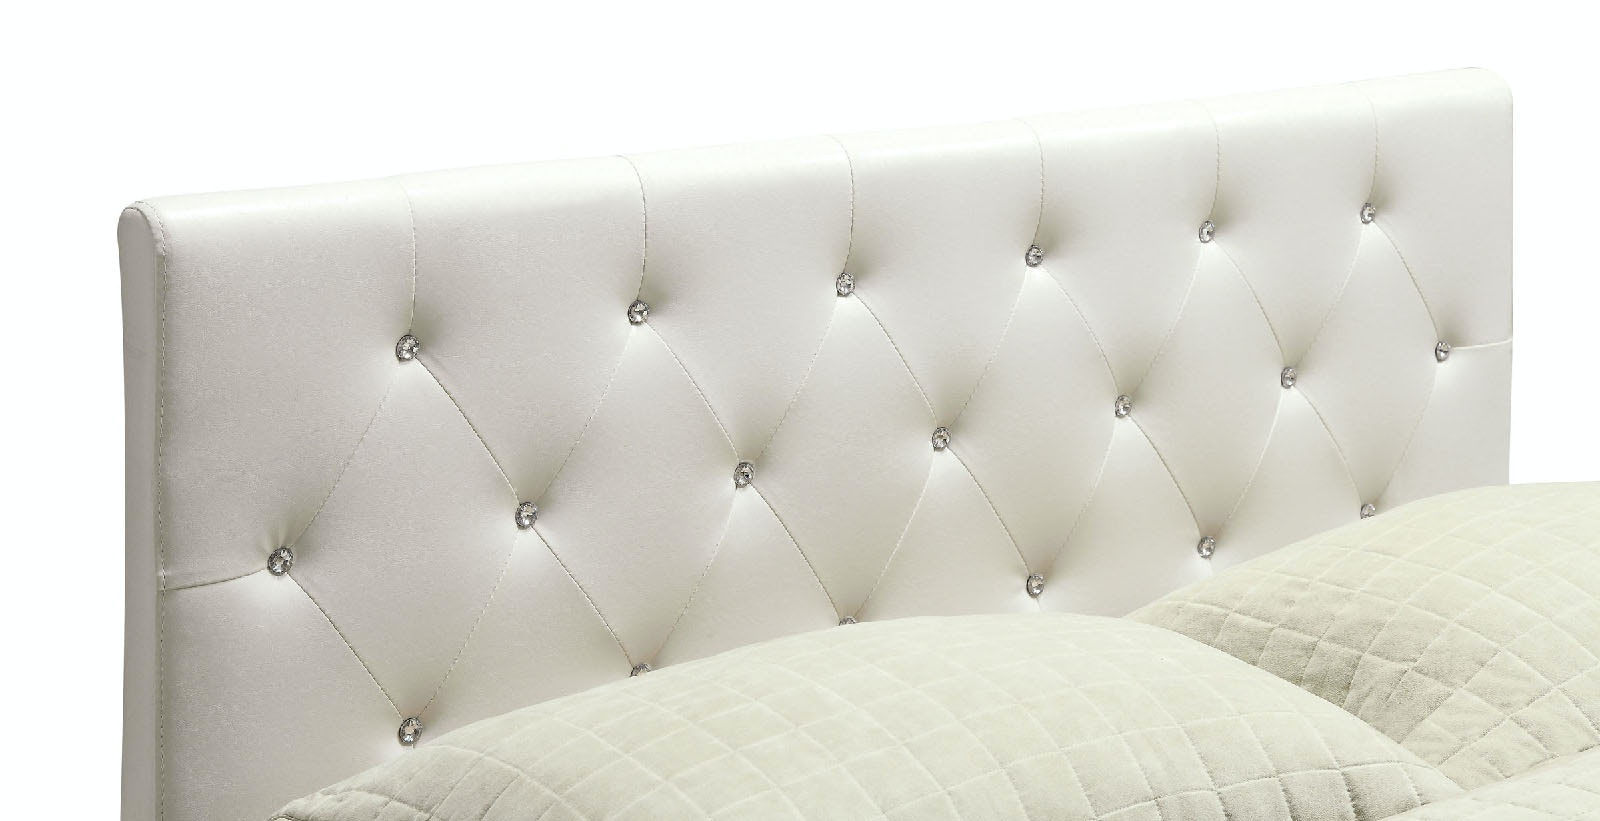 compatible furniture. Furniture Of America Queen (Full Compatible) Headboard, White CM7949WH-HB-FQ Compatible